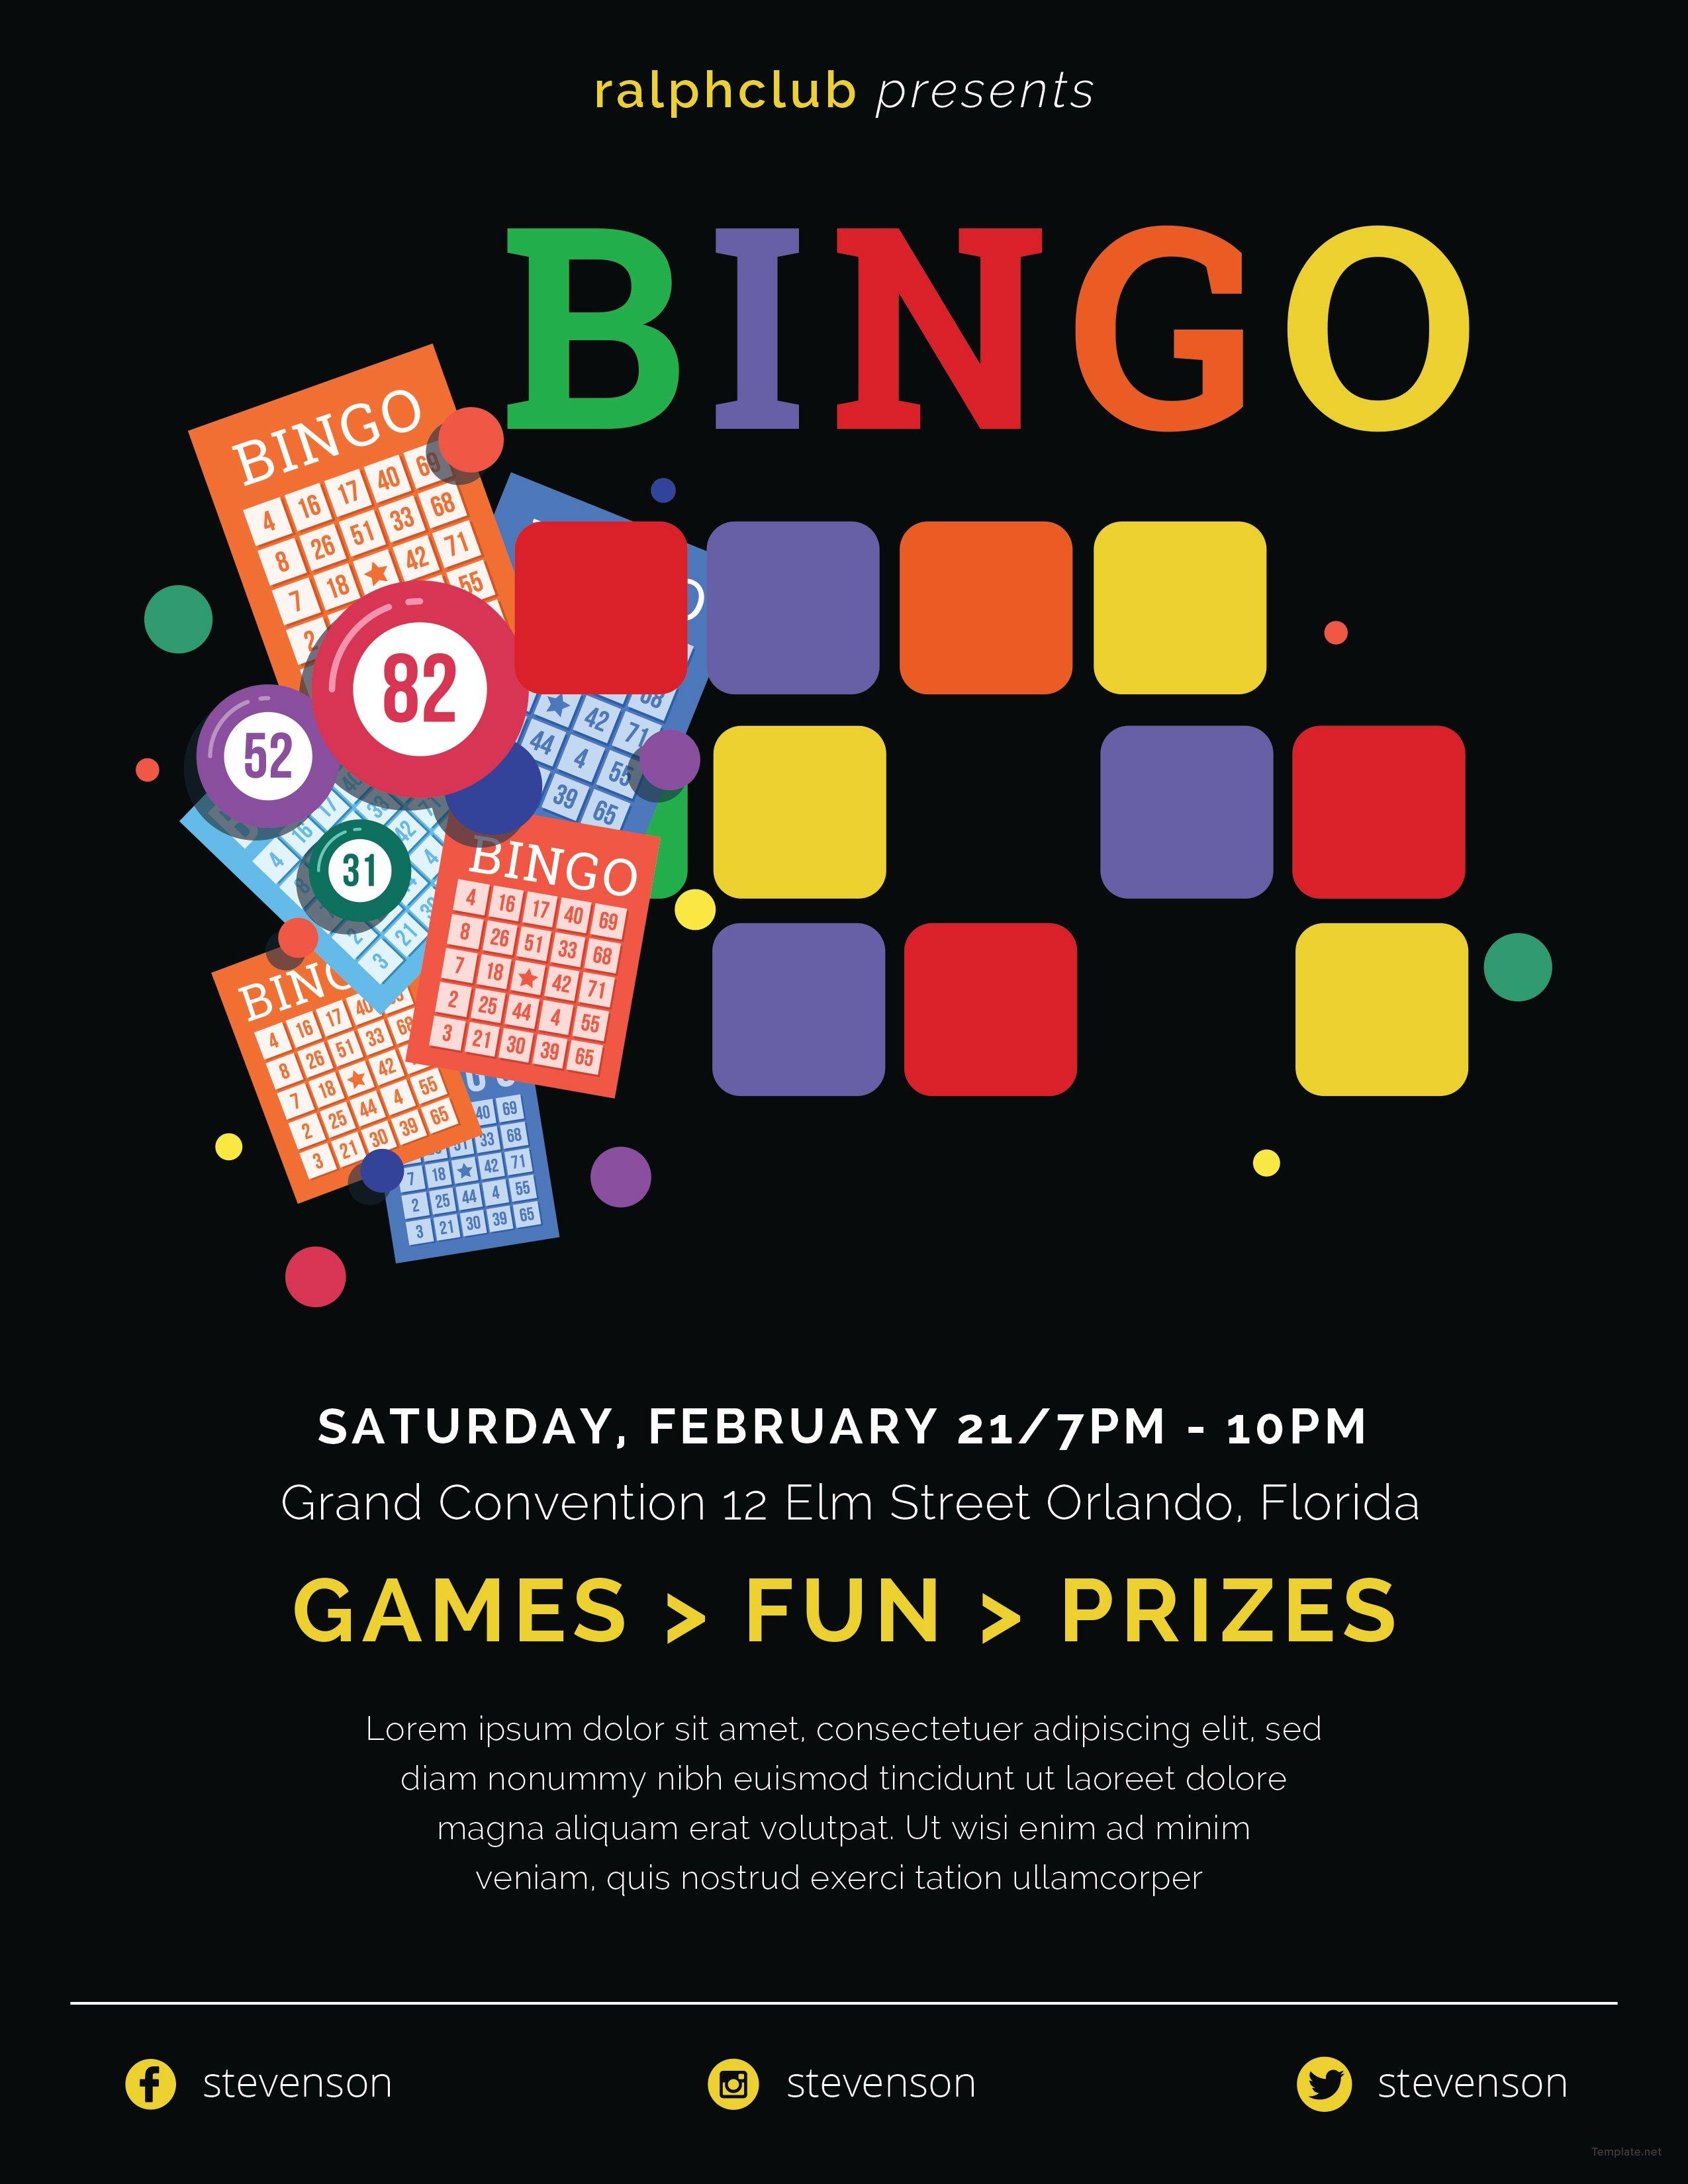 Free Bingo Flyer Template in Adobe Photoshop, Microsoft ...